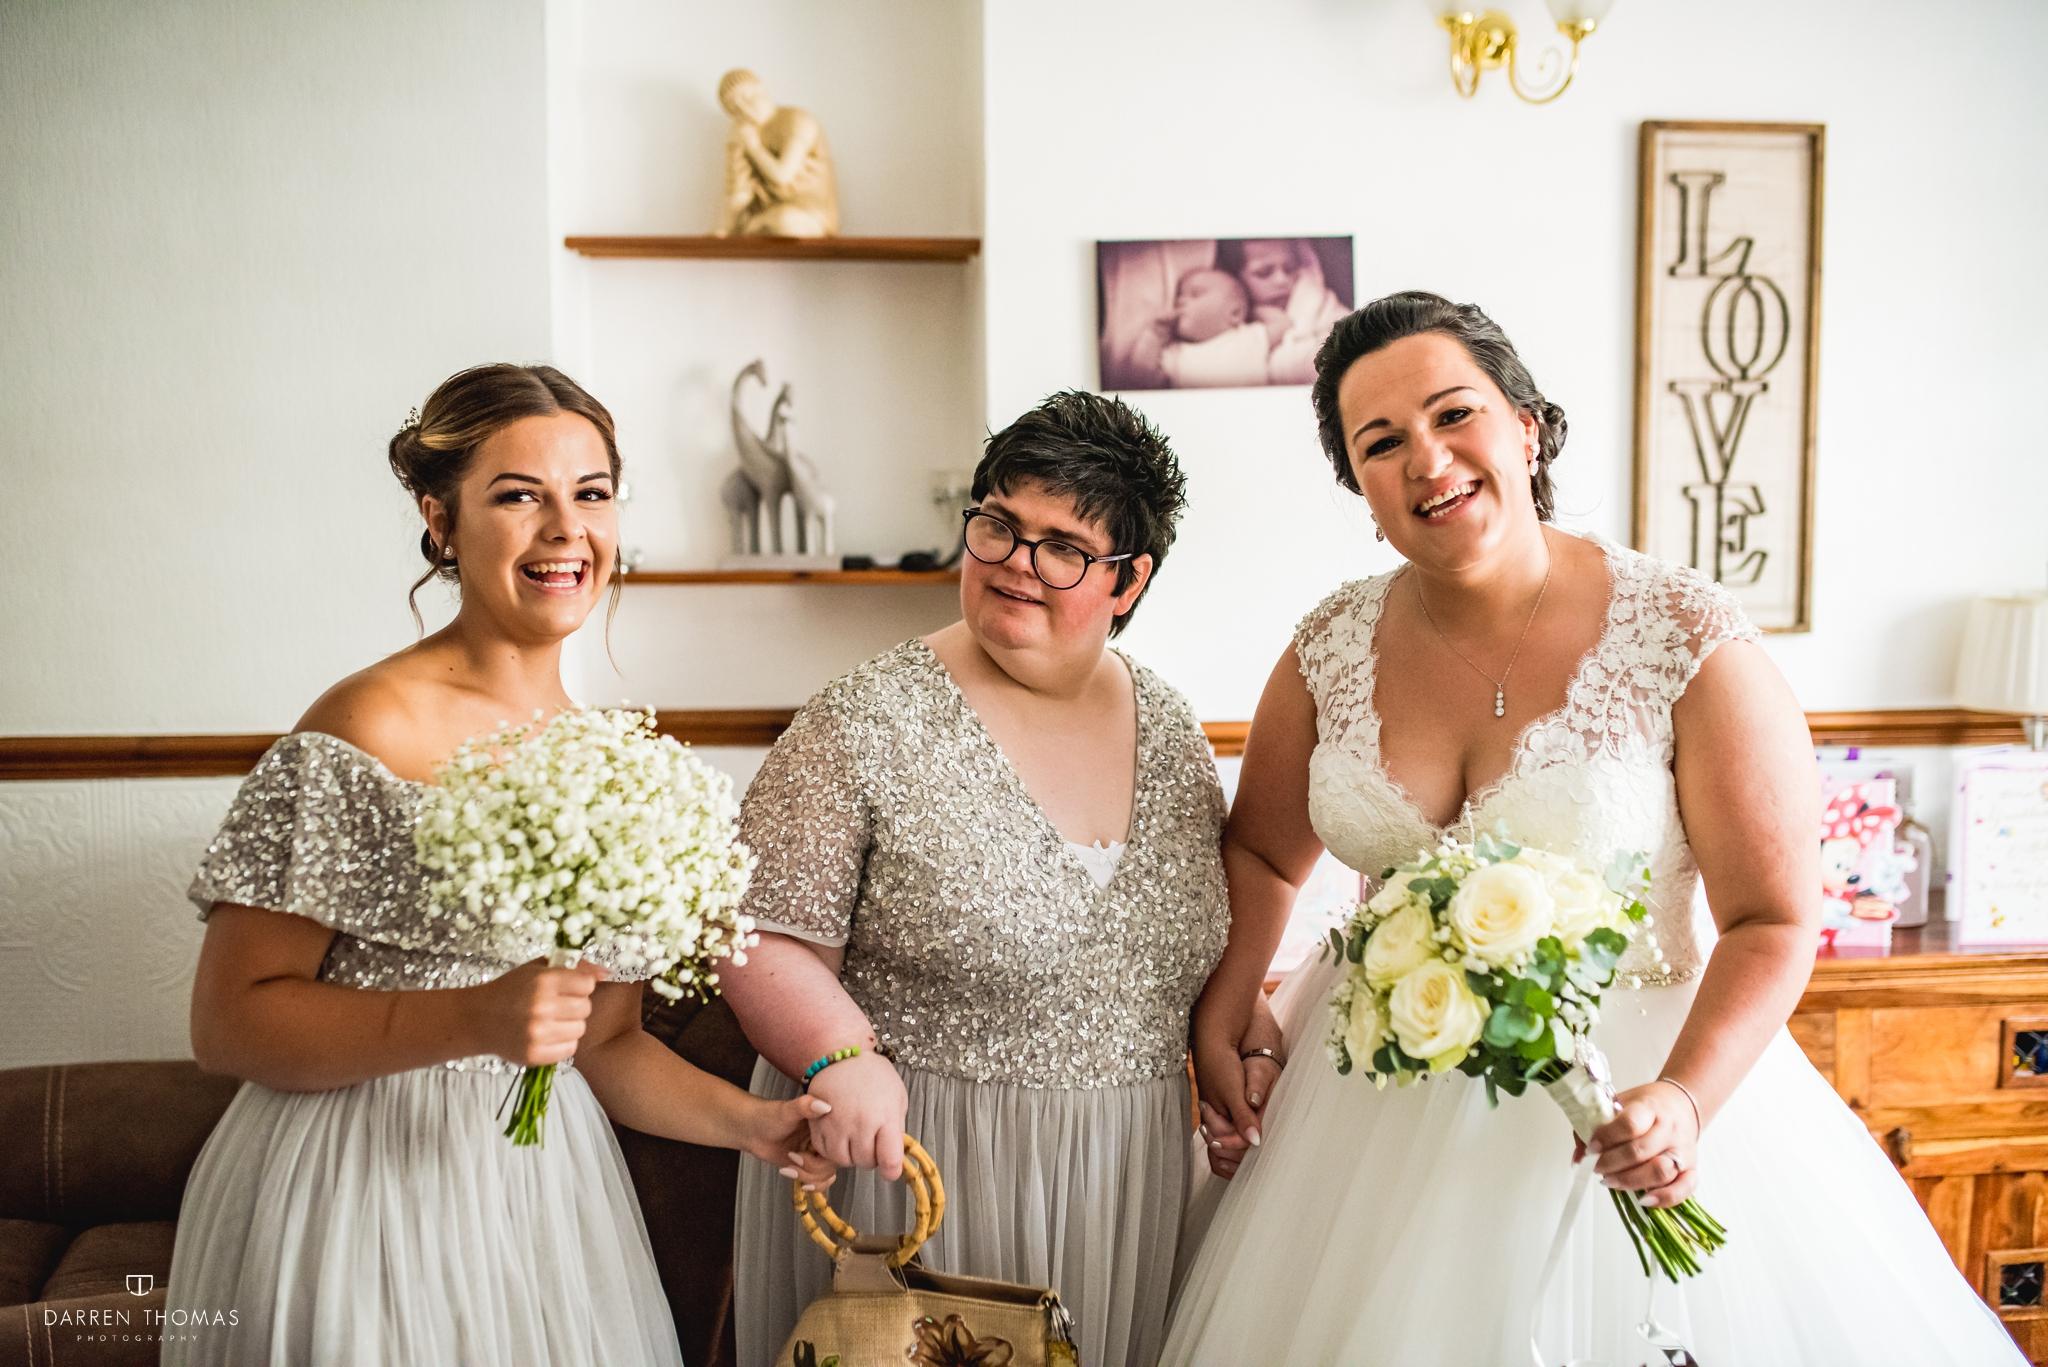 Llechwen-hall-wedding-photography7.jpg